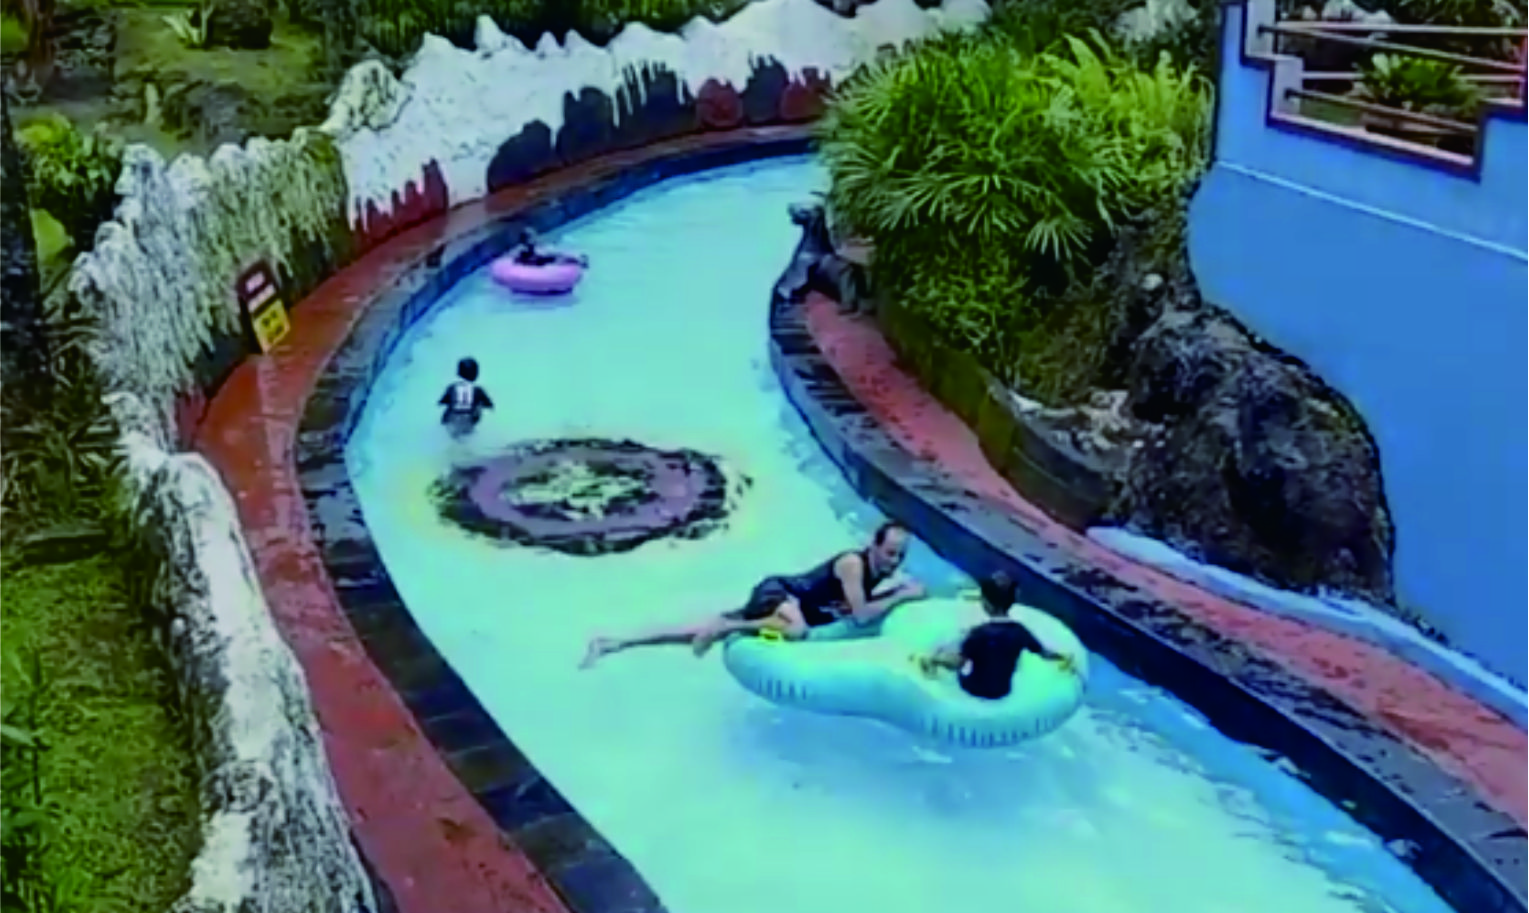 Owabong Purbalingga, Tempat Rekreasi Keluarga yang Menyenangkan